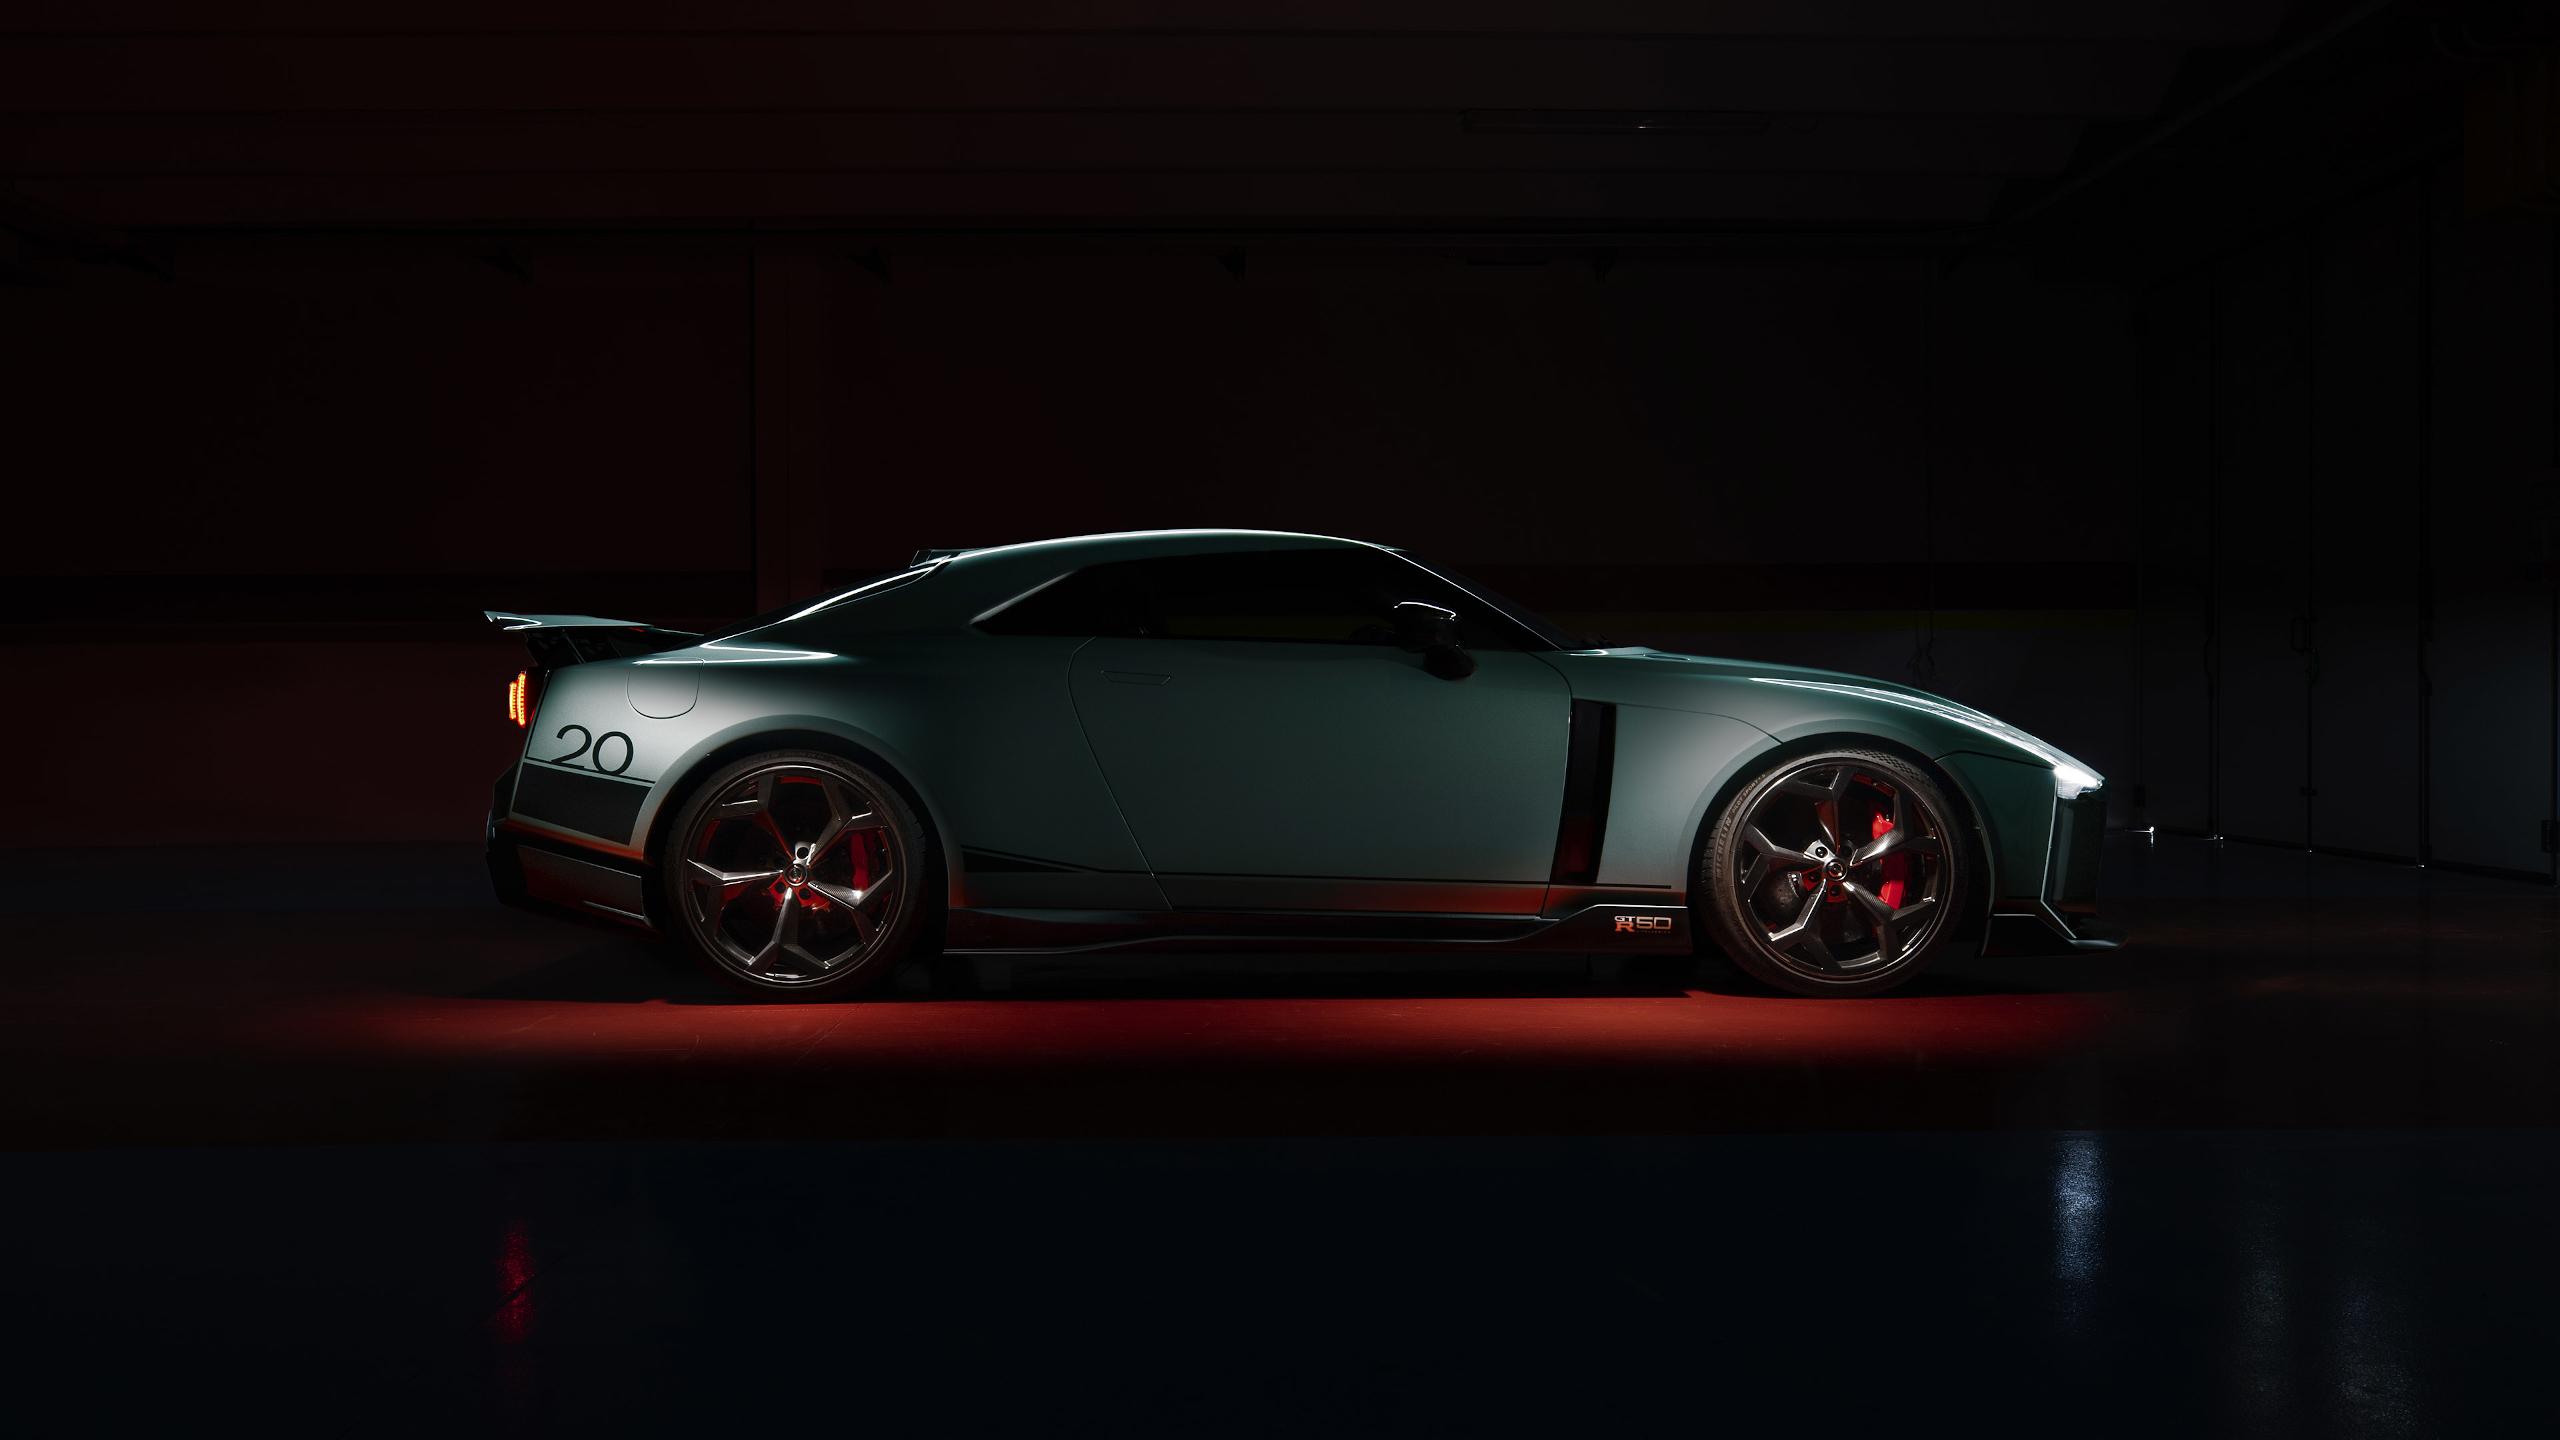 General 2560x1440 Nissan GT-R50 italdesign vehicle car supercars low light spotlights